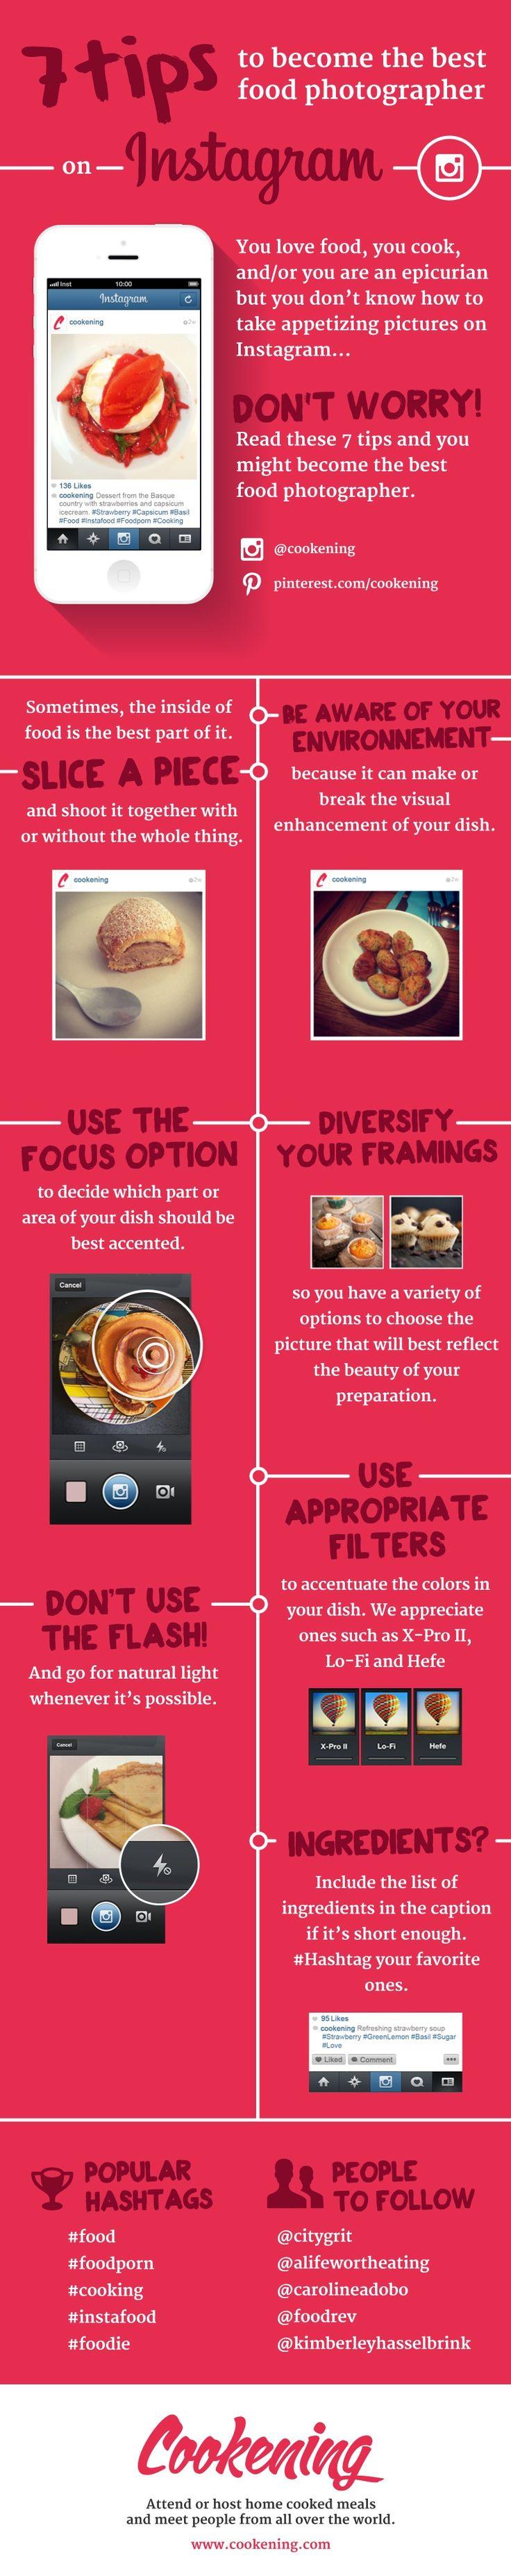 Instagram Photo Tips